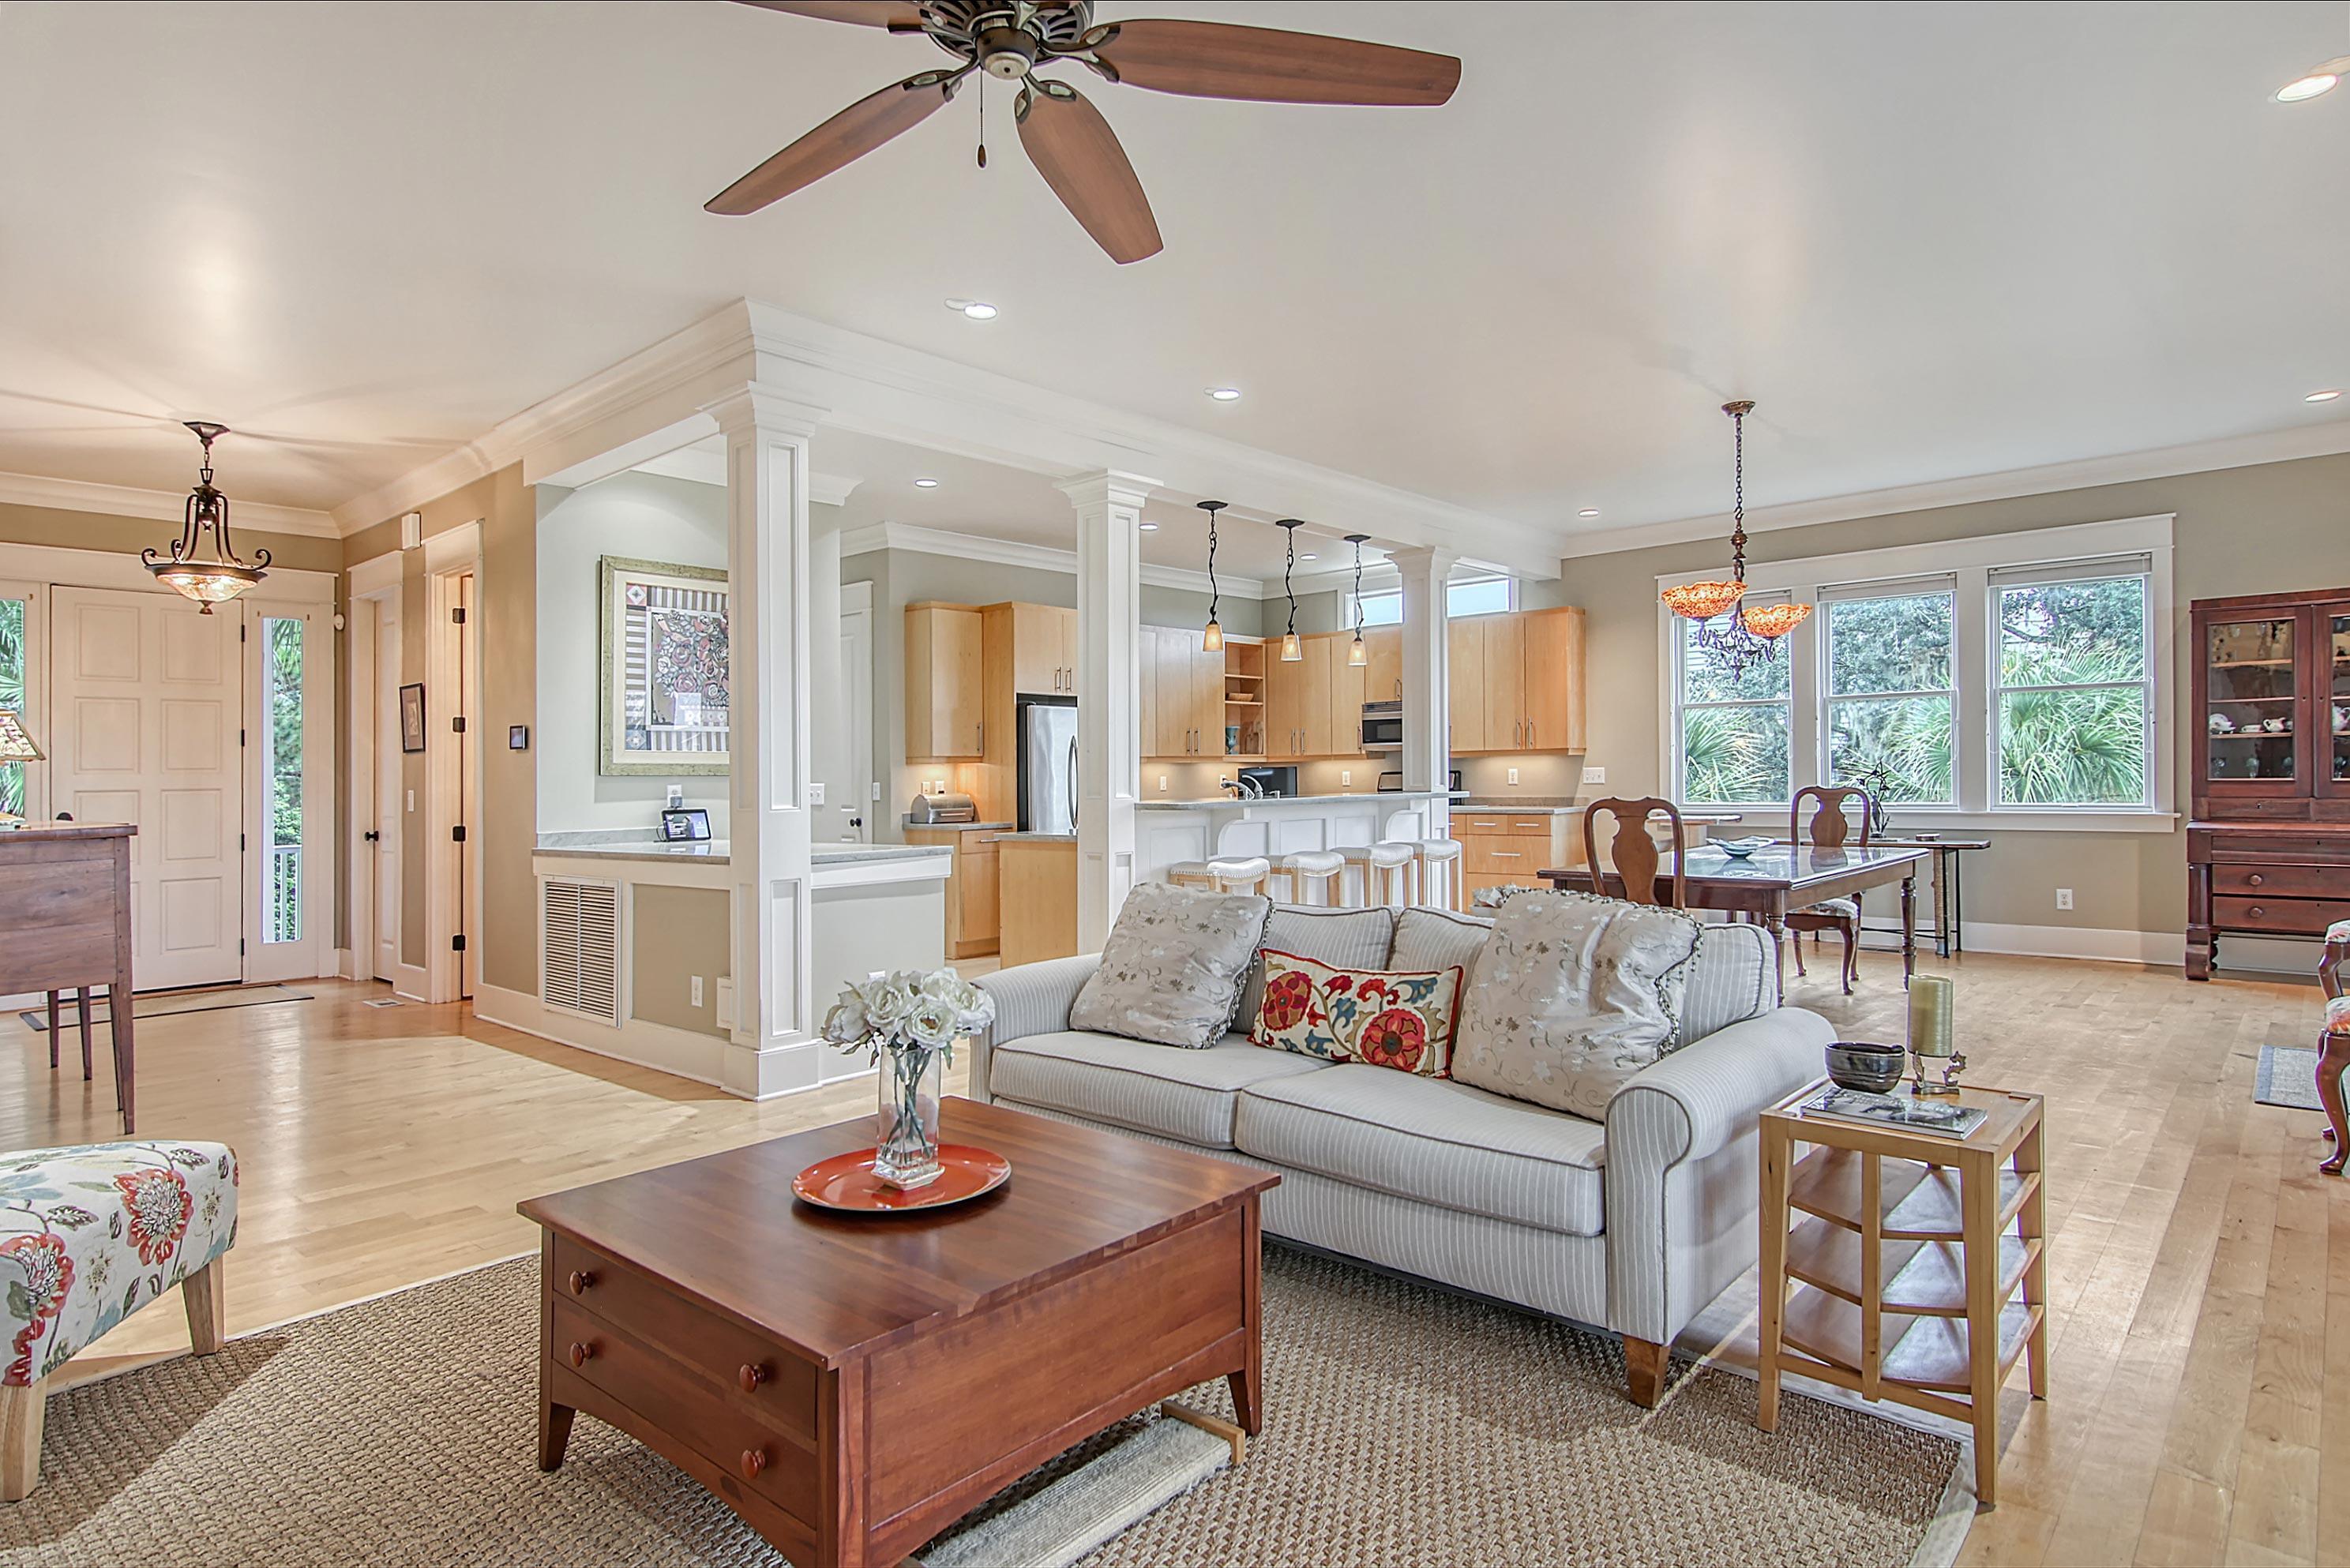 Scanlonville Homes For Sale - 152 6th, Mount Pleasant, SC - 12